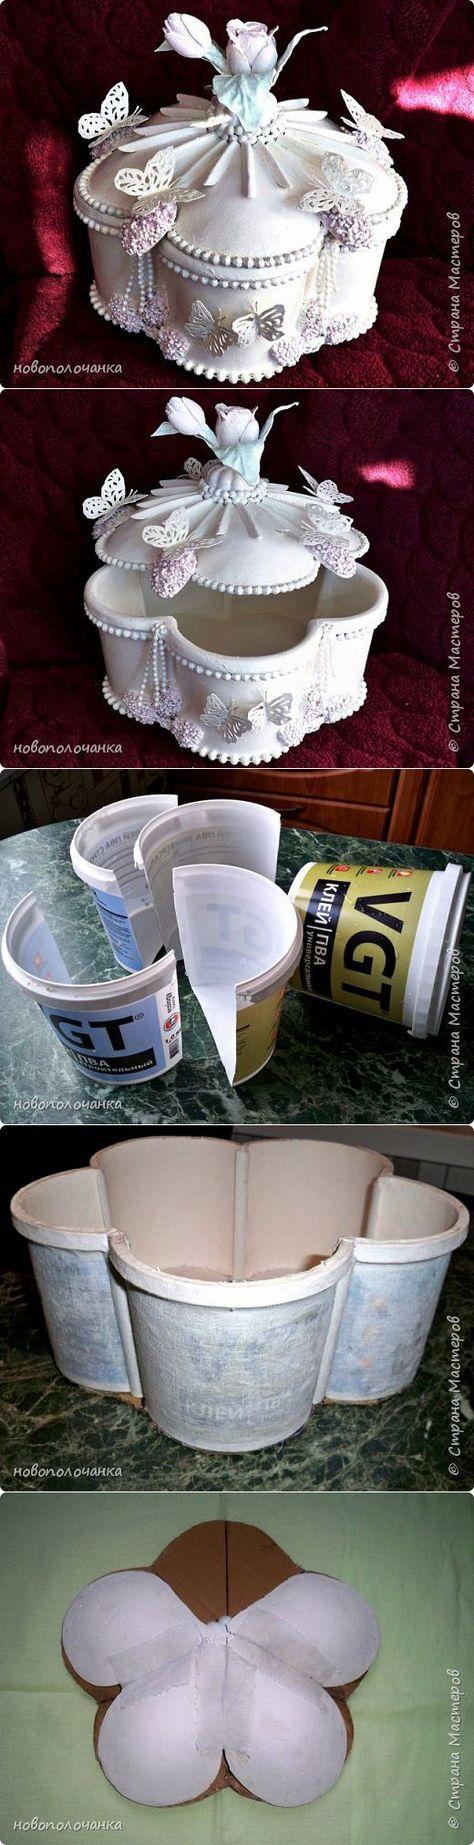 102 Mejores Im Genes De Craft Recycle Plastic En Pinterest  # Muebles El Zar Toedo